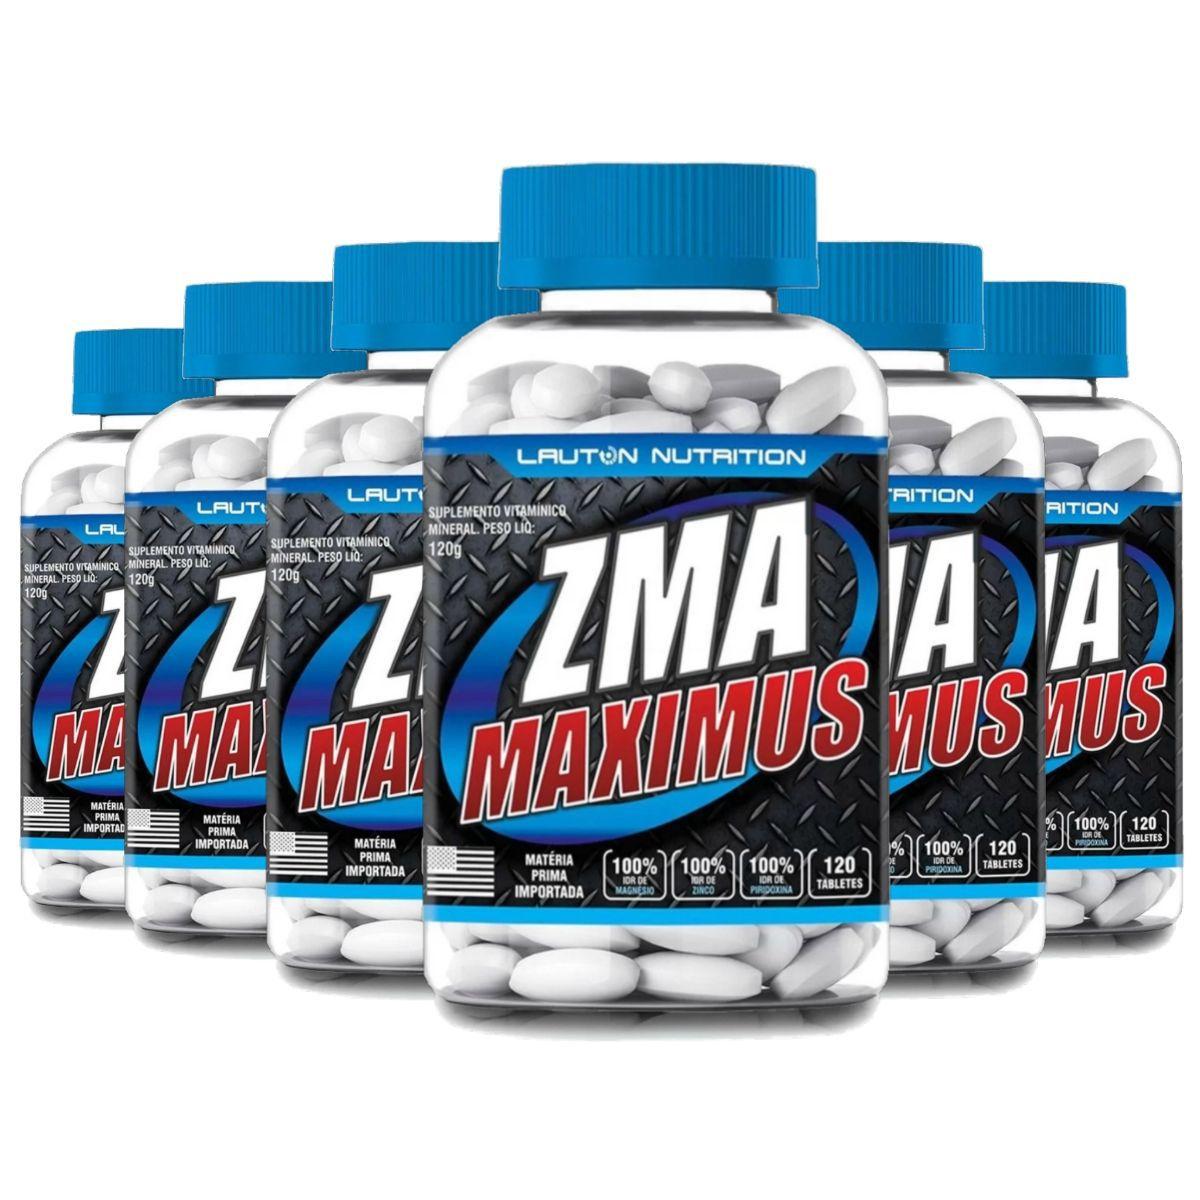 Kit 6 ZMA Maximus Lauton Nutrition - 120 Tablets 1G